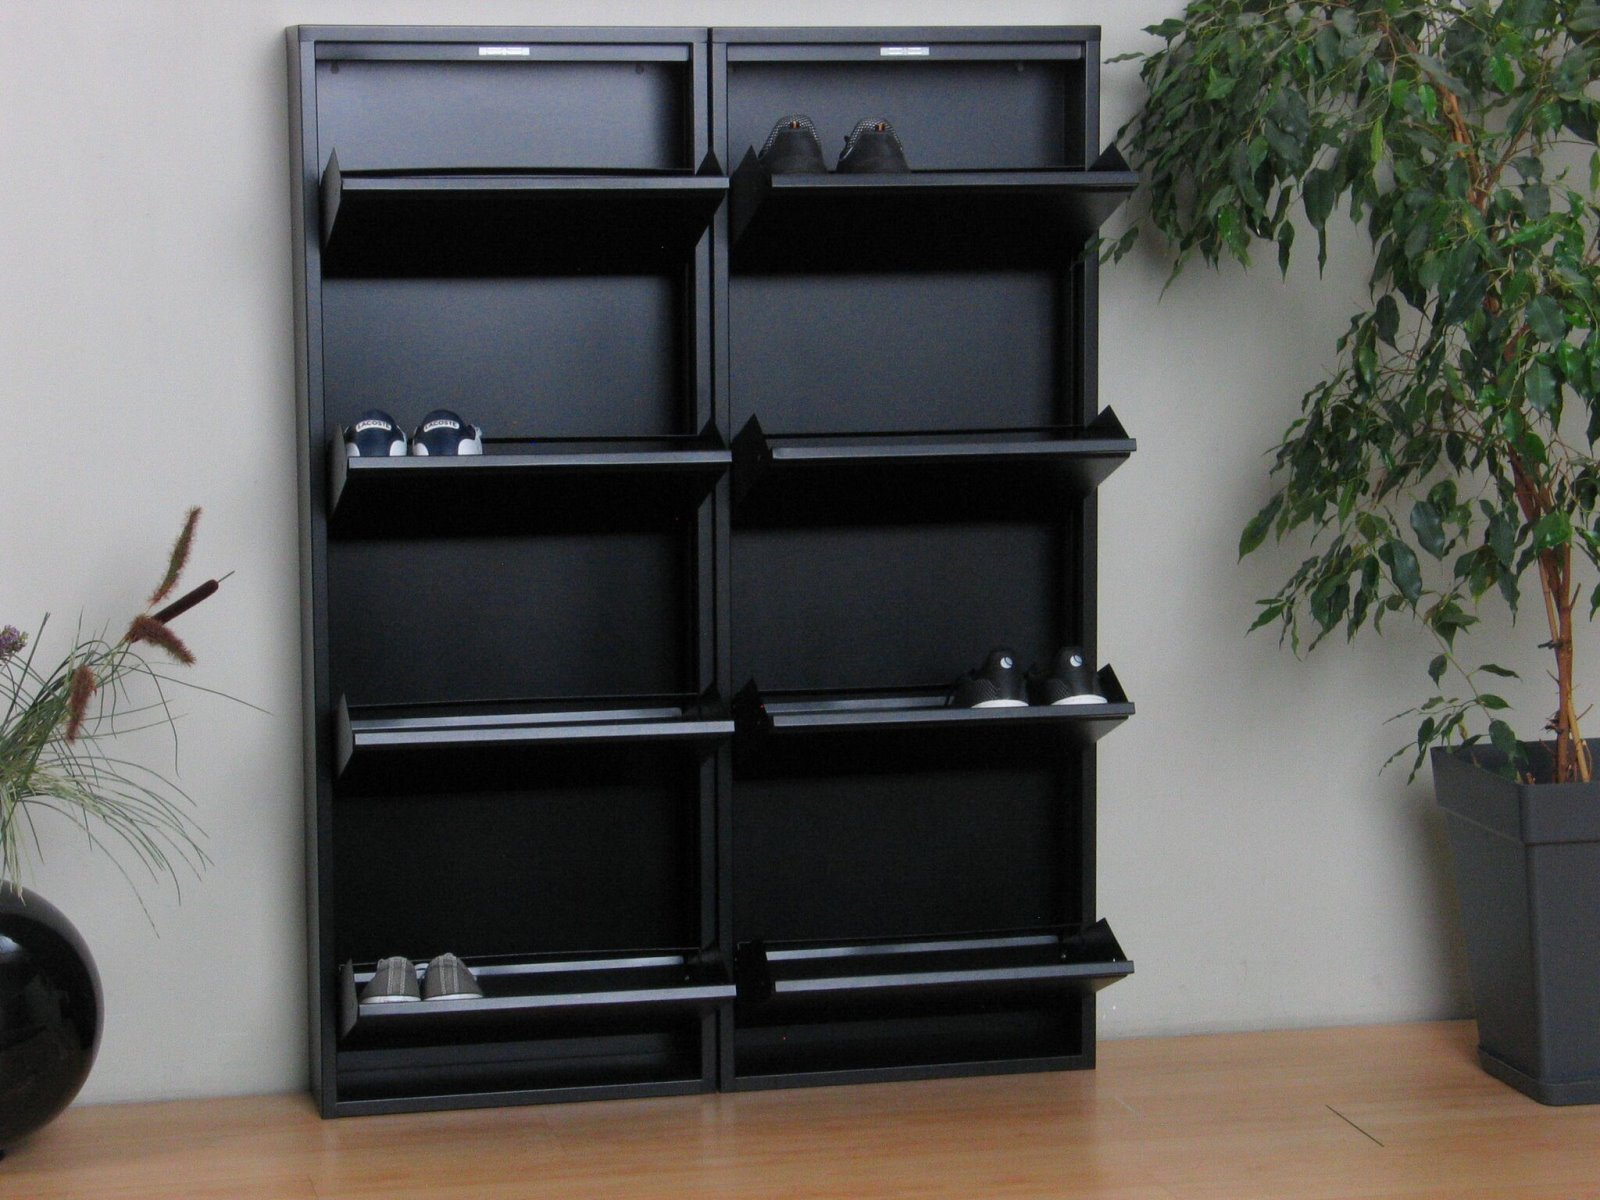 xl schuhschrank pisa 8 klappen metall schuhkipper. Black Bedroom Furniture Sets. Home Design Ideas